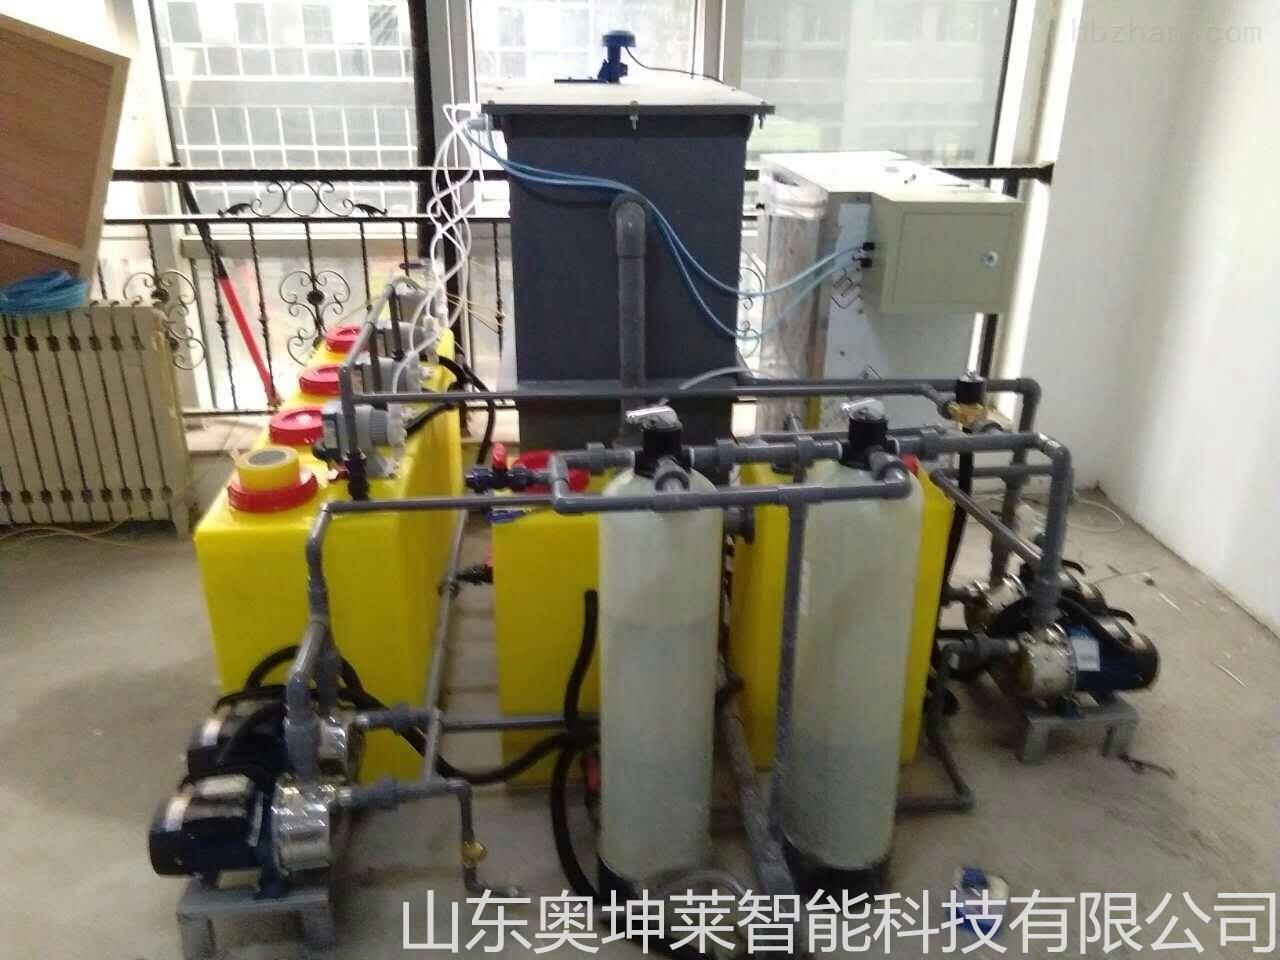 p3,p4 等实验室所产生的废水; 畜牧兽医:动物防疫,病原微生物等实验室